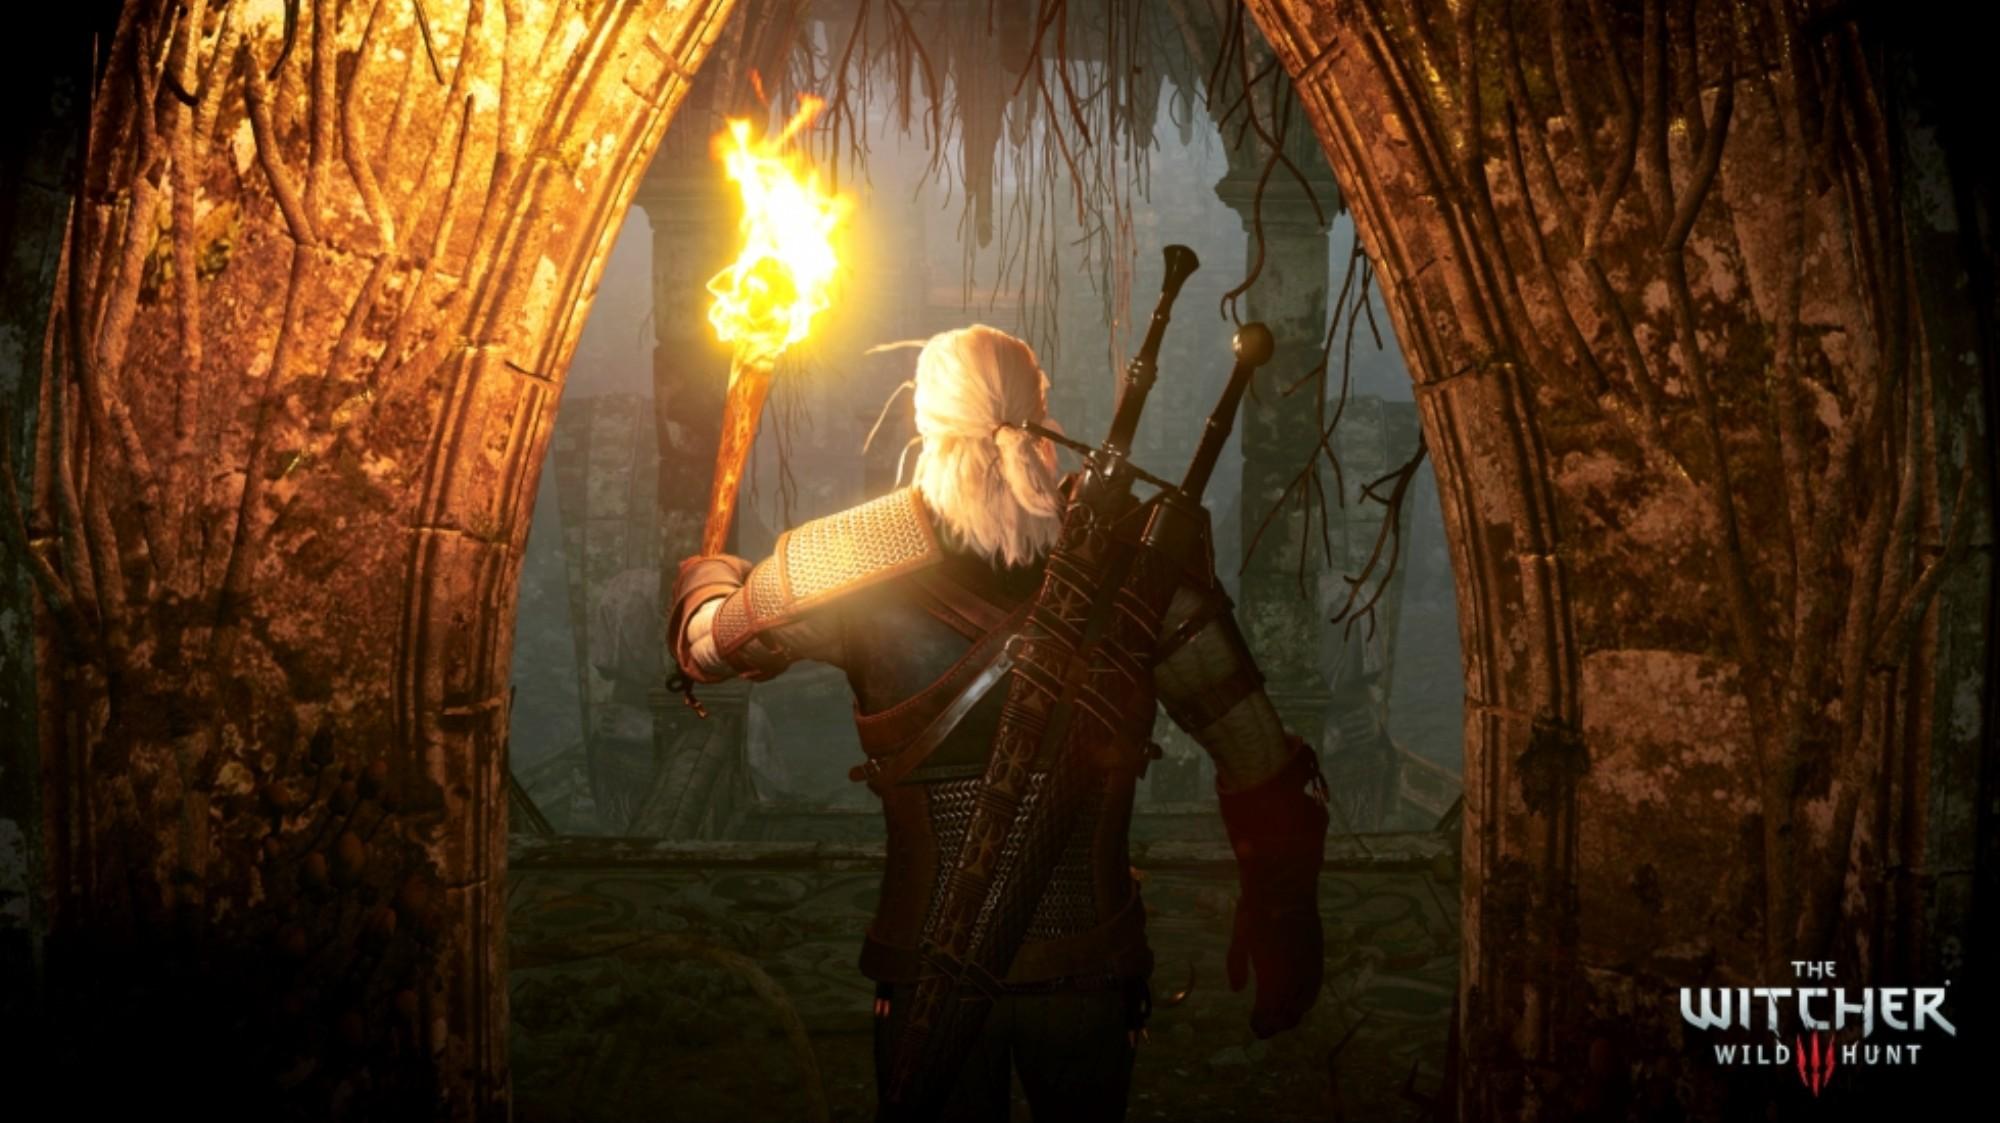 How Reading an Original Witcher Story Made a Modern Quest